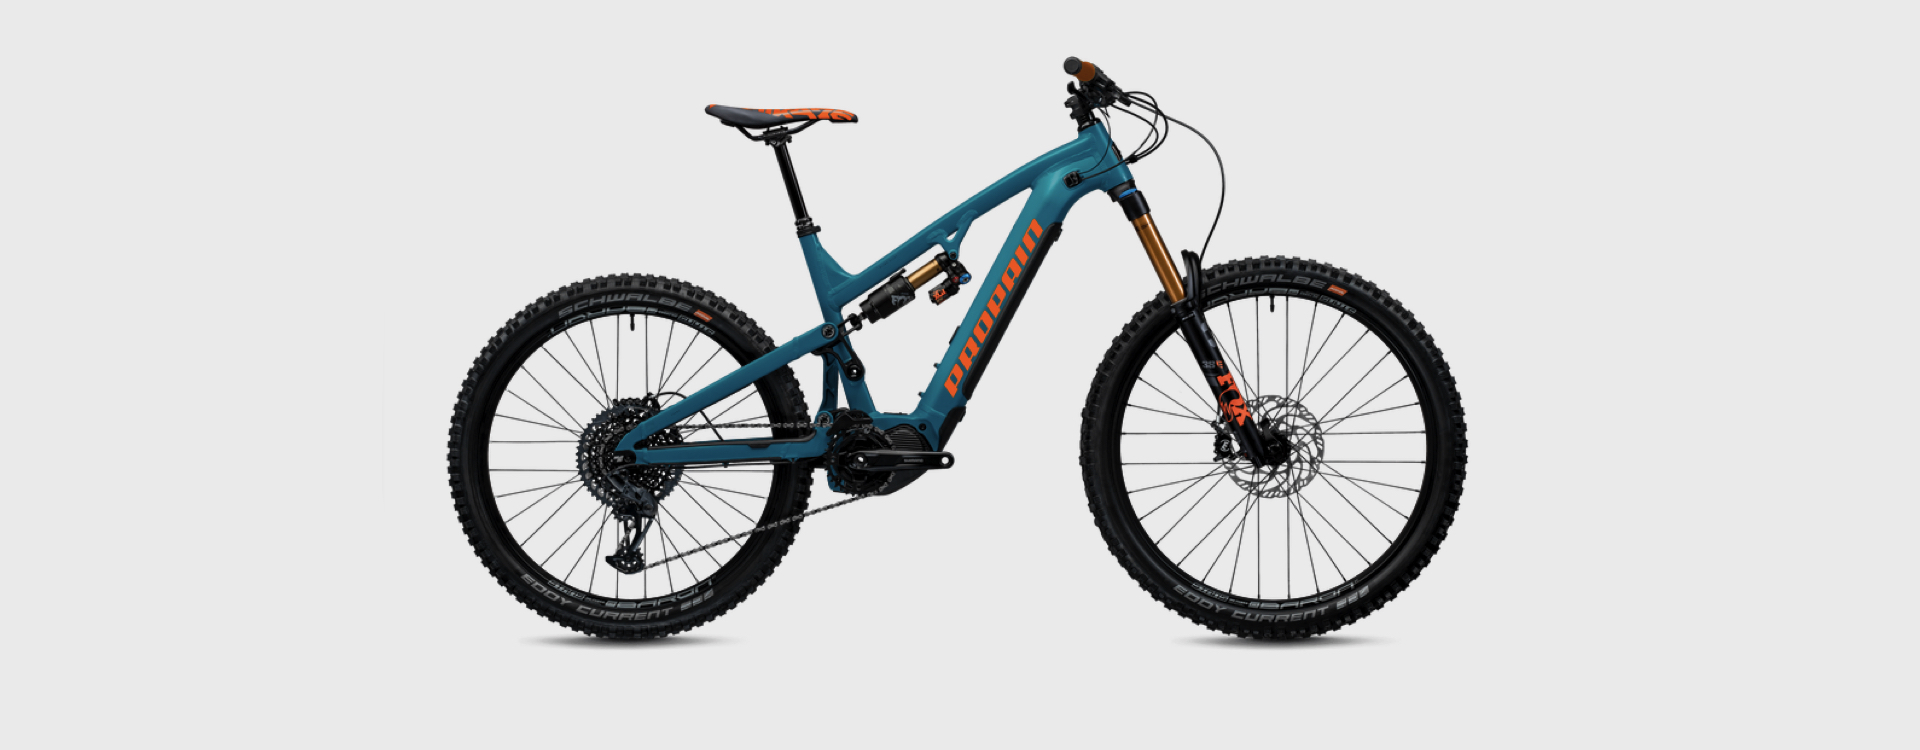 Bike Verleih Gummersbach Propain Bikes Testcenter NRW Ekano 11 - AL - XL - 29 - Petrol - 1920x750